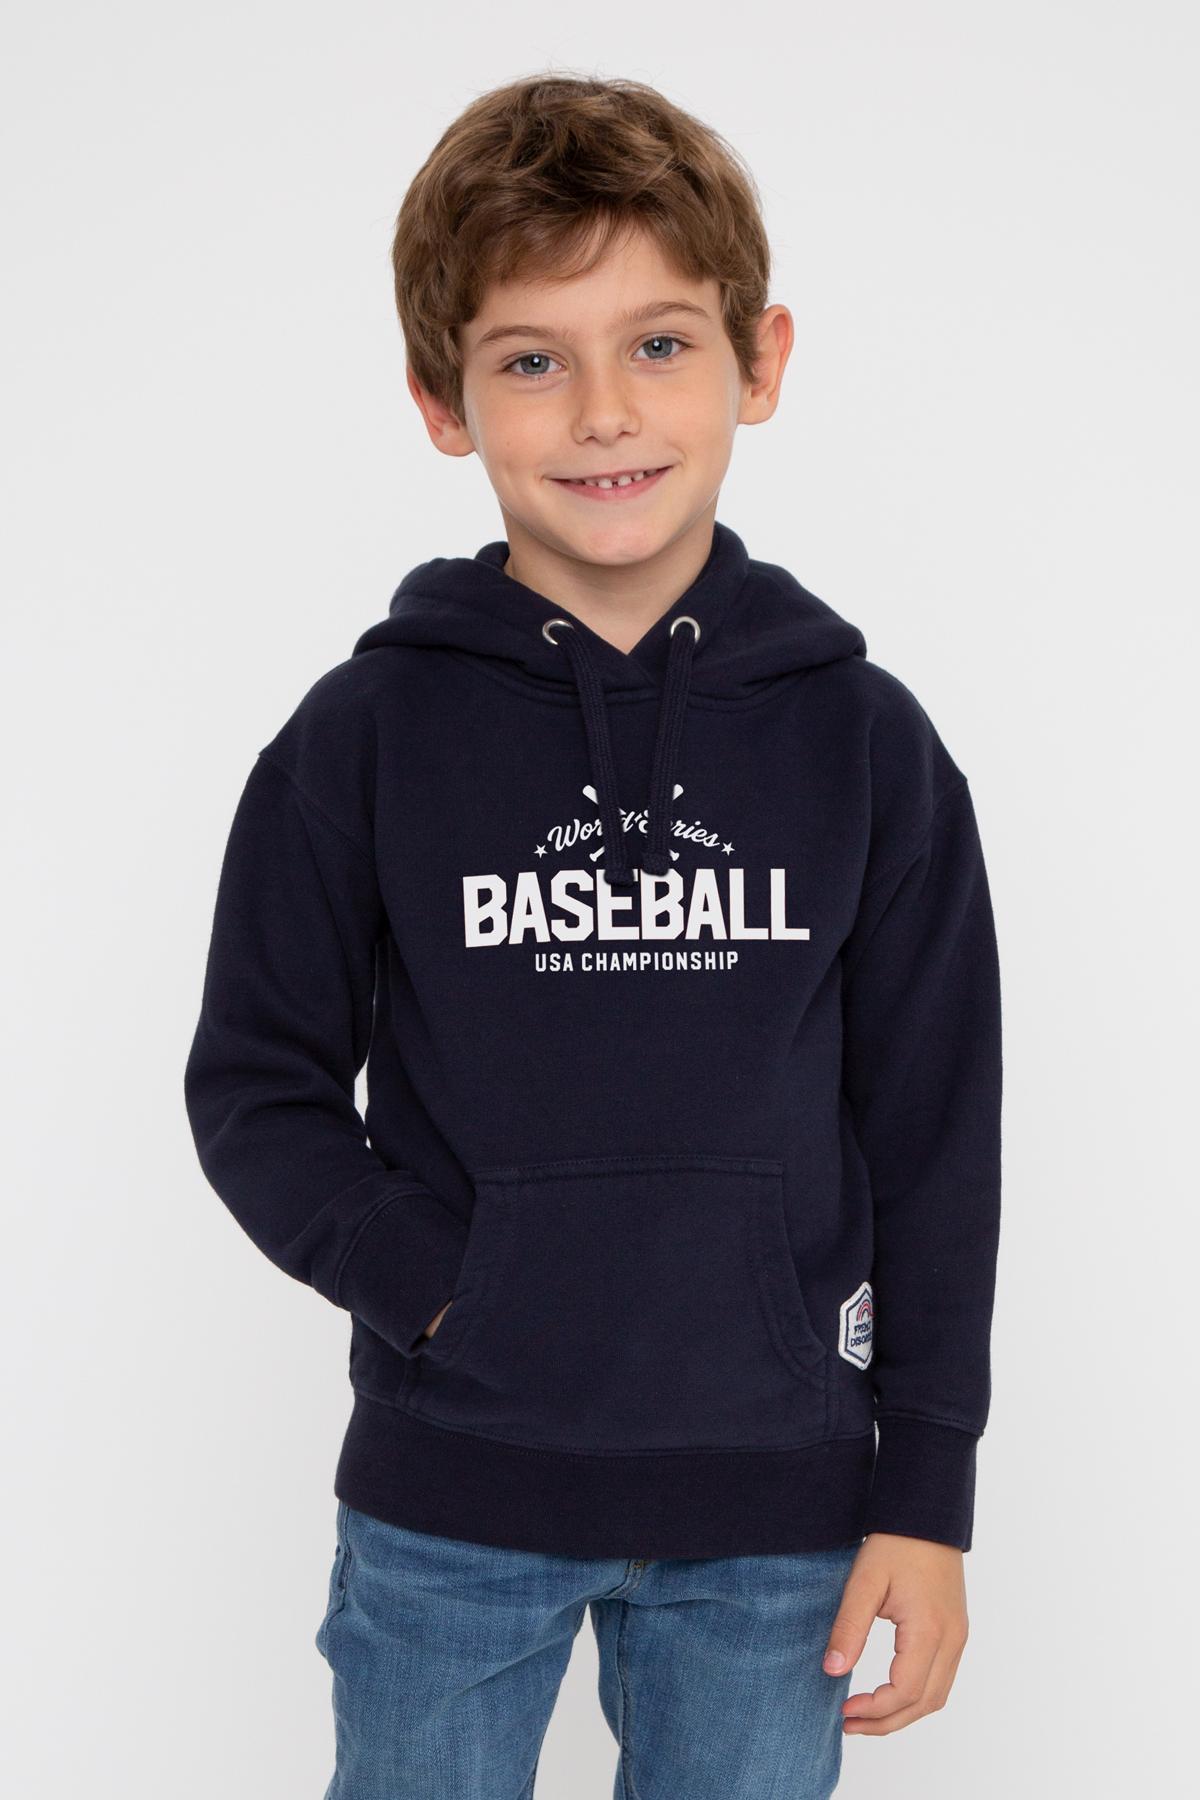 Photo de SWEATS À CAPUCHE Hoodie Kids BASEBALL chez French Disorder